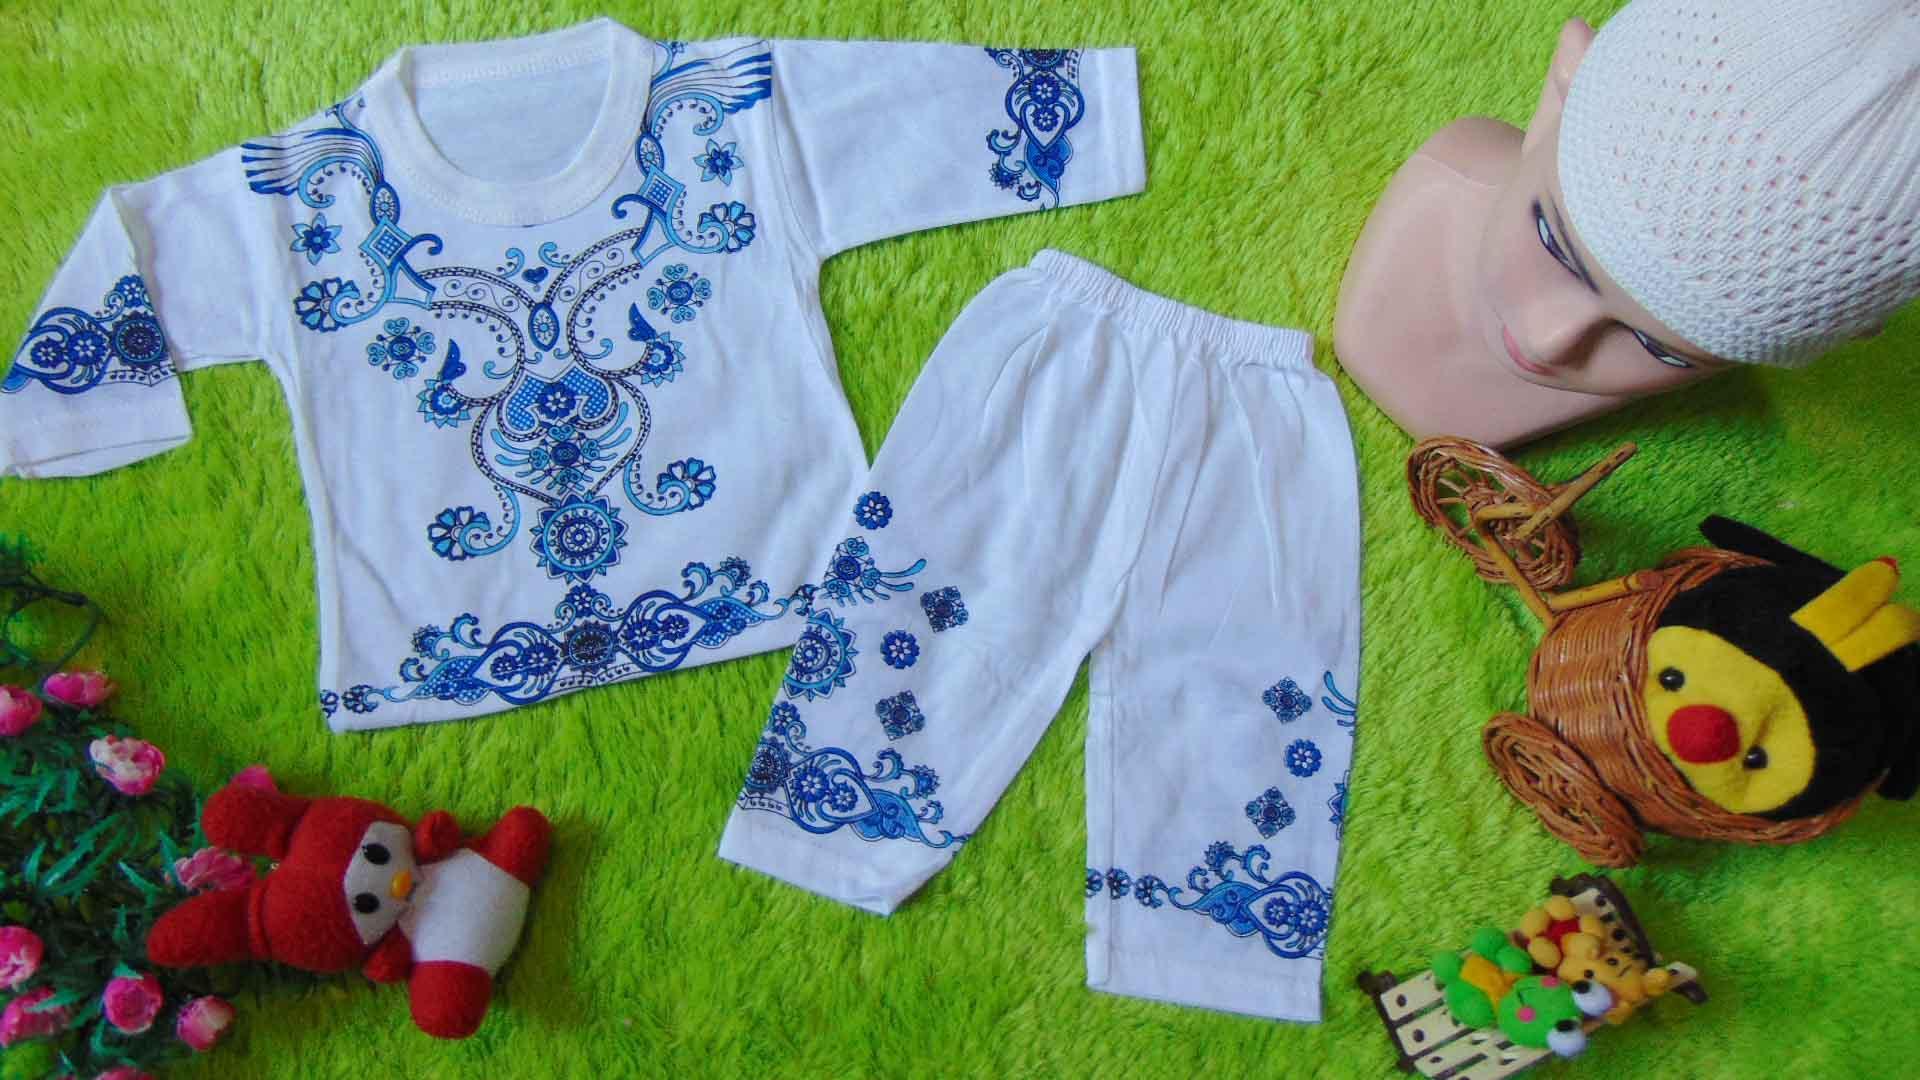 kembarshop - PALING MURAH set baju koko bayi newborn 0-6bulan putih sablon ukuran S